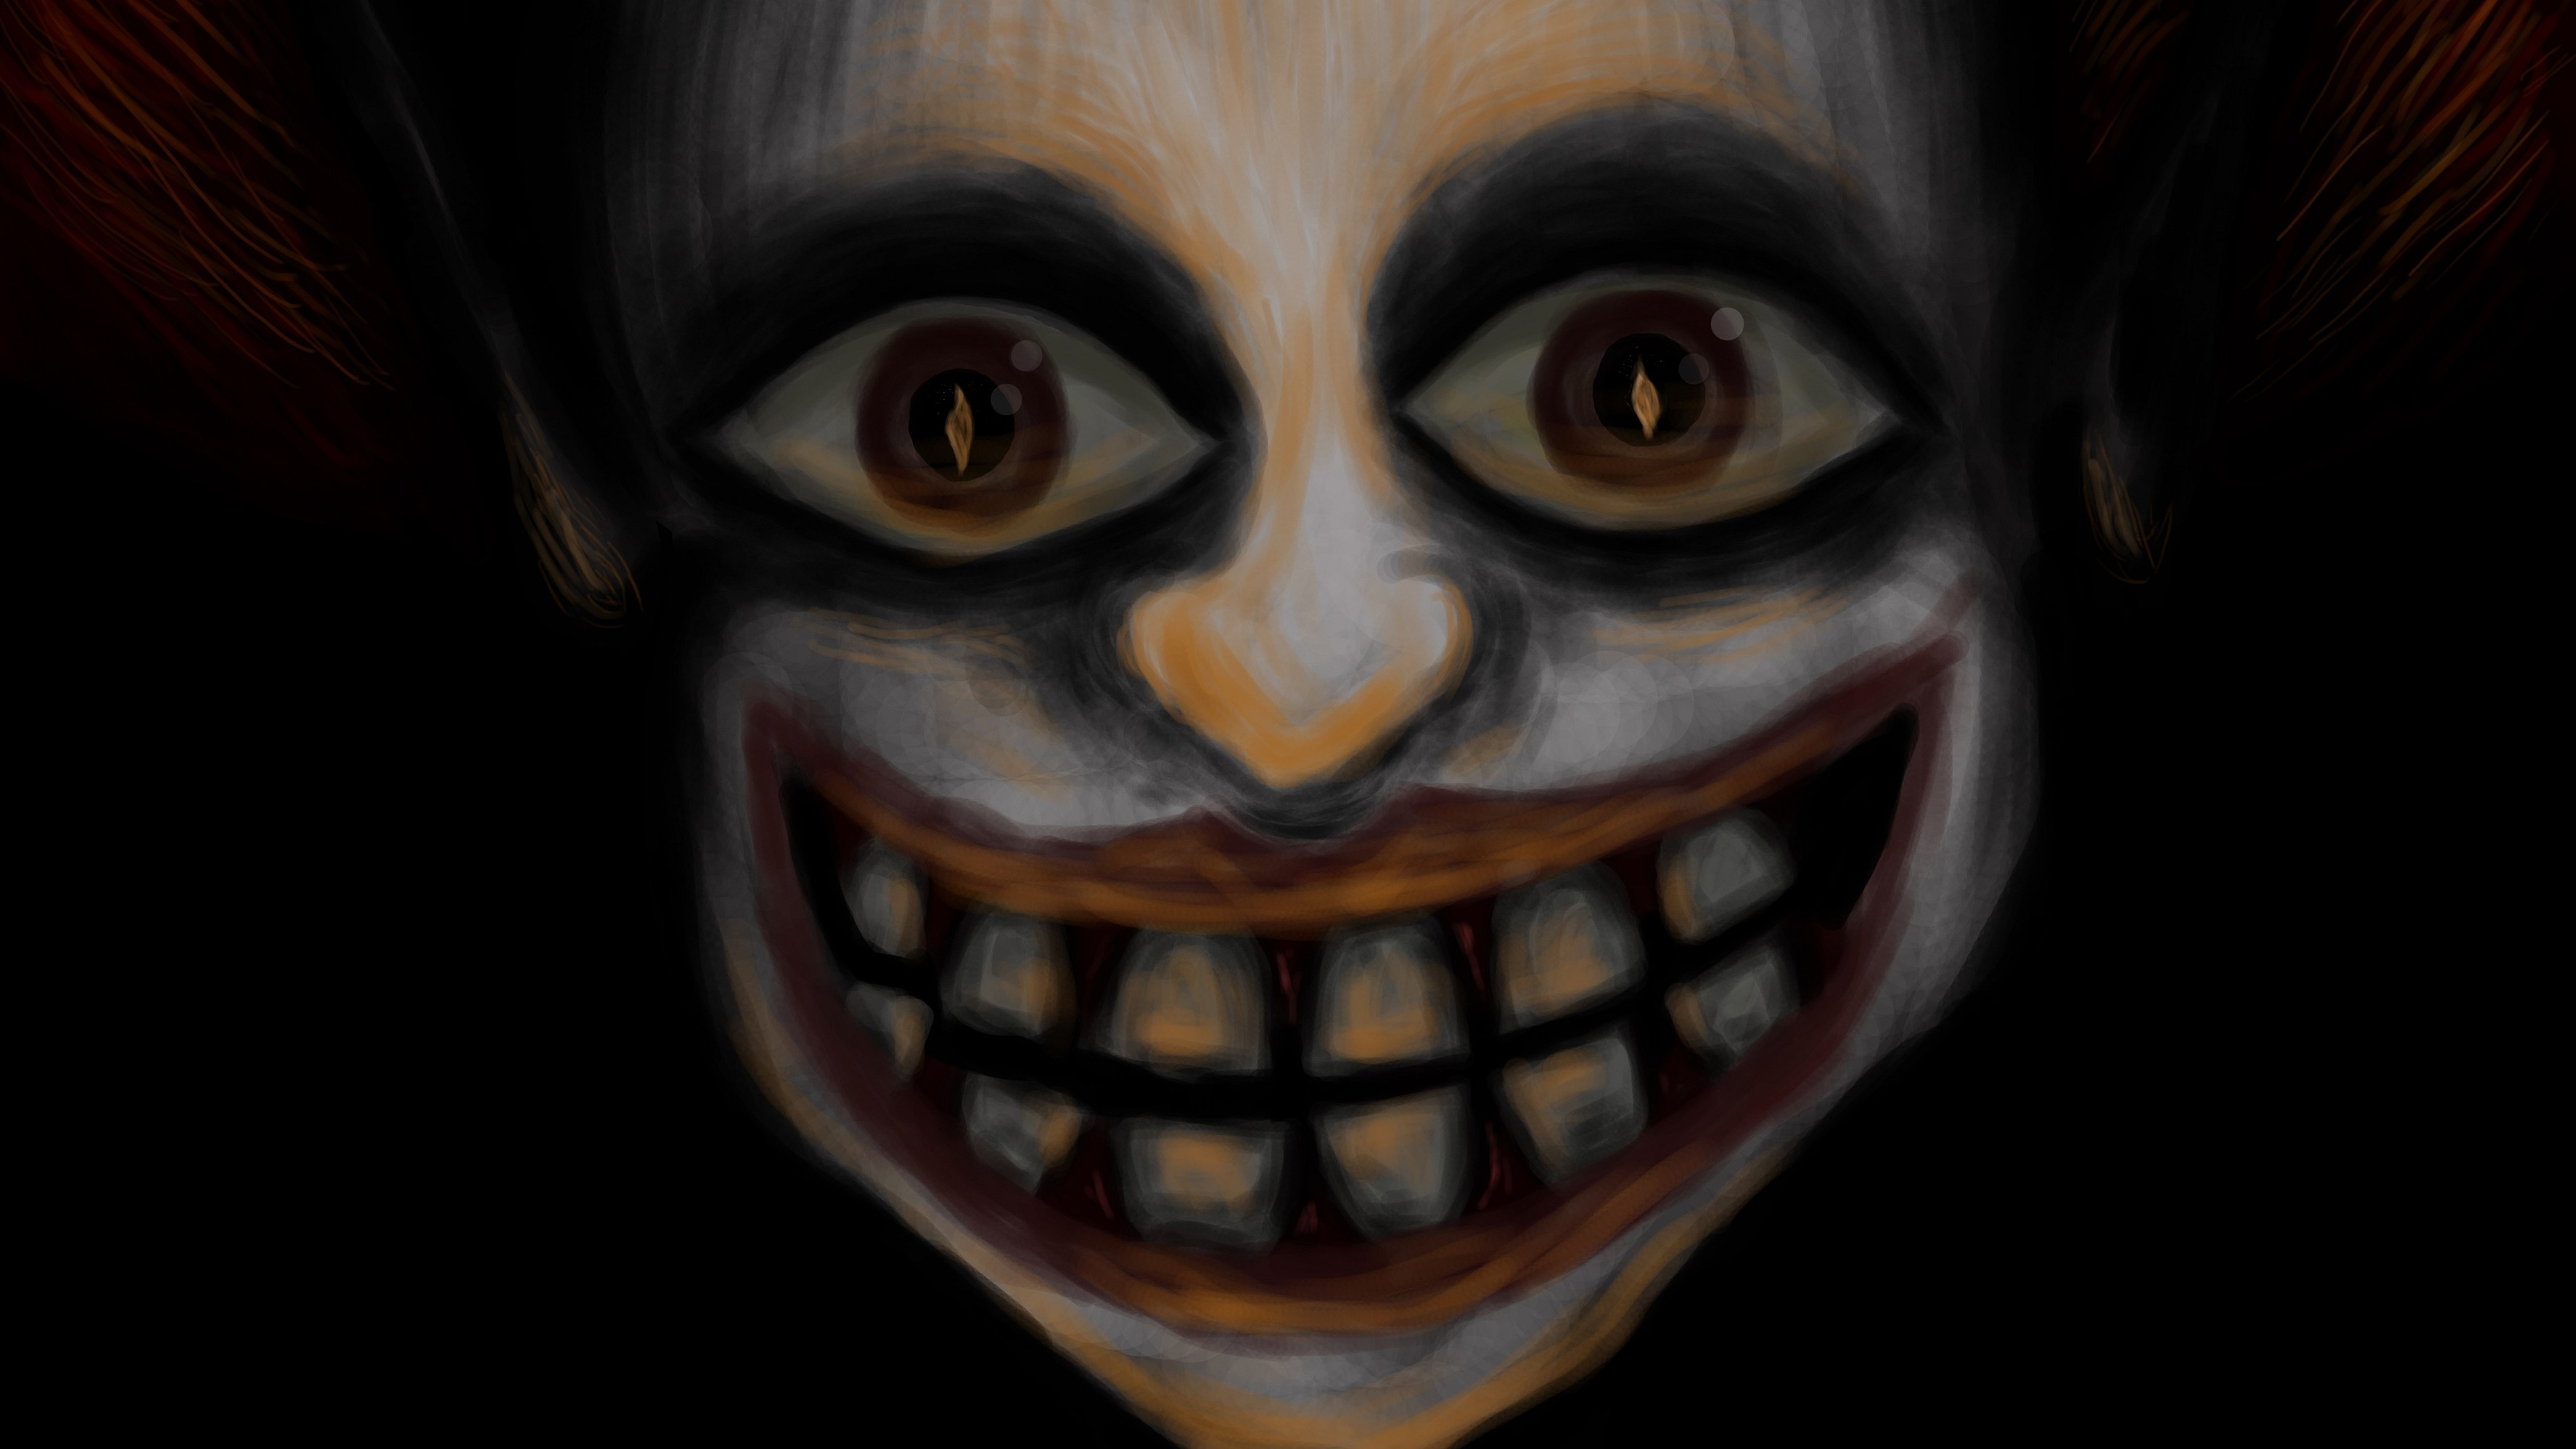 Creepy Hd Wallpaper: Scary Clown Wallpaper Screensavers (61+ Images